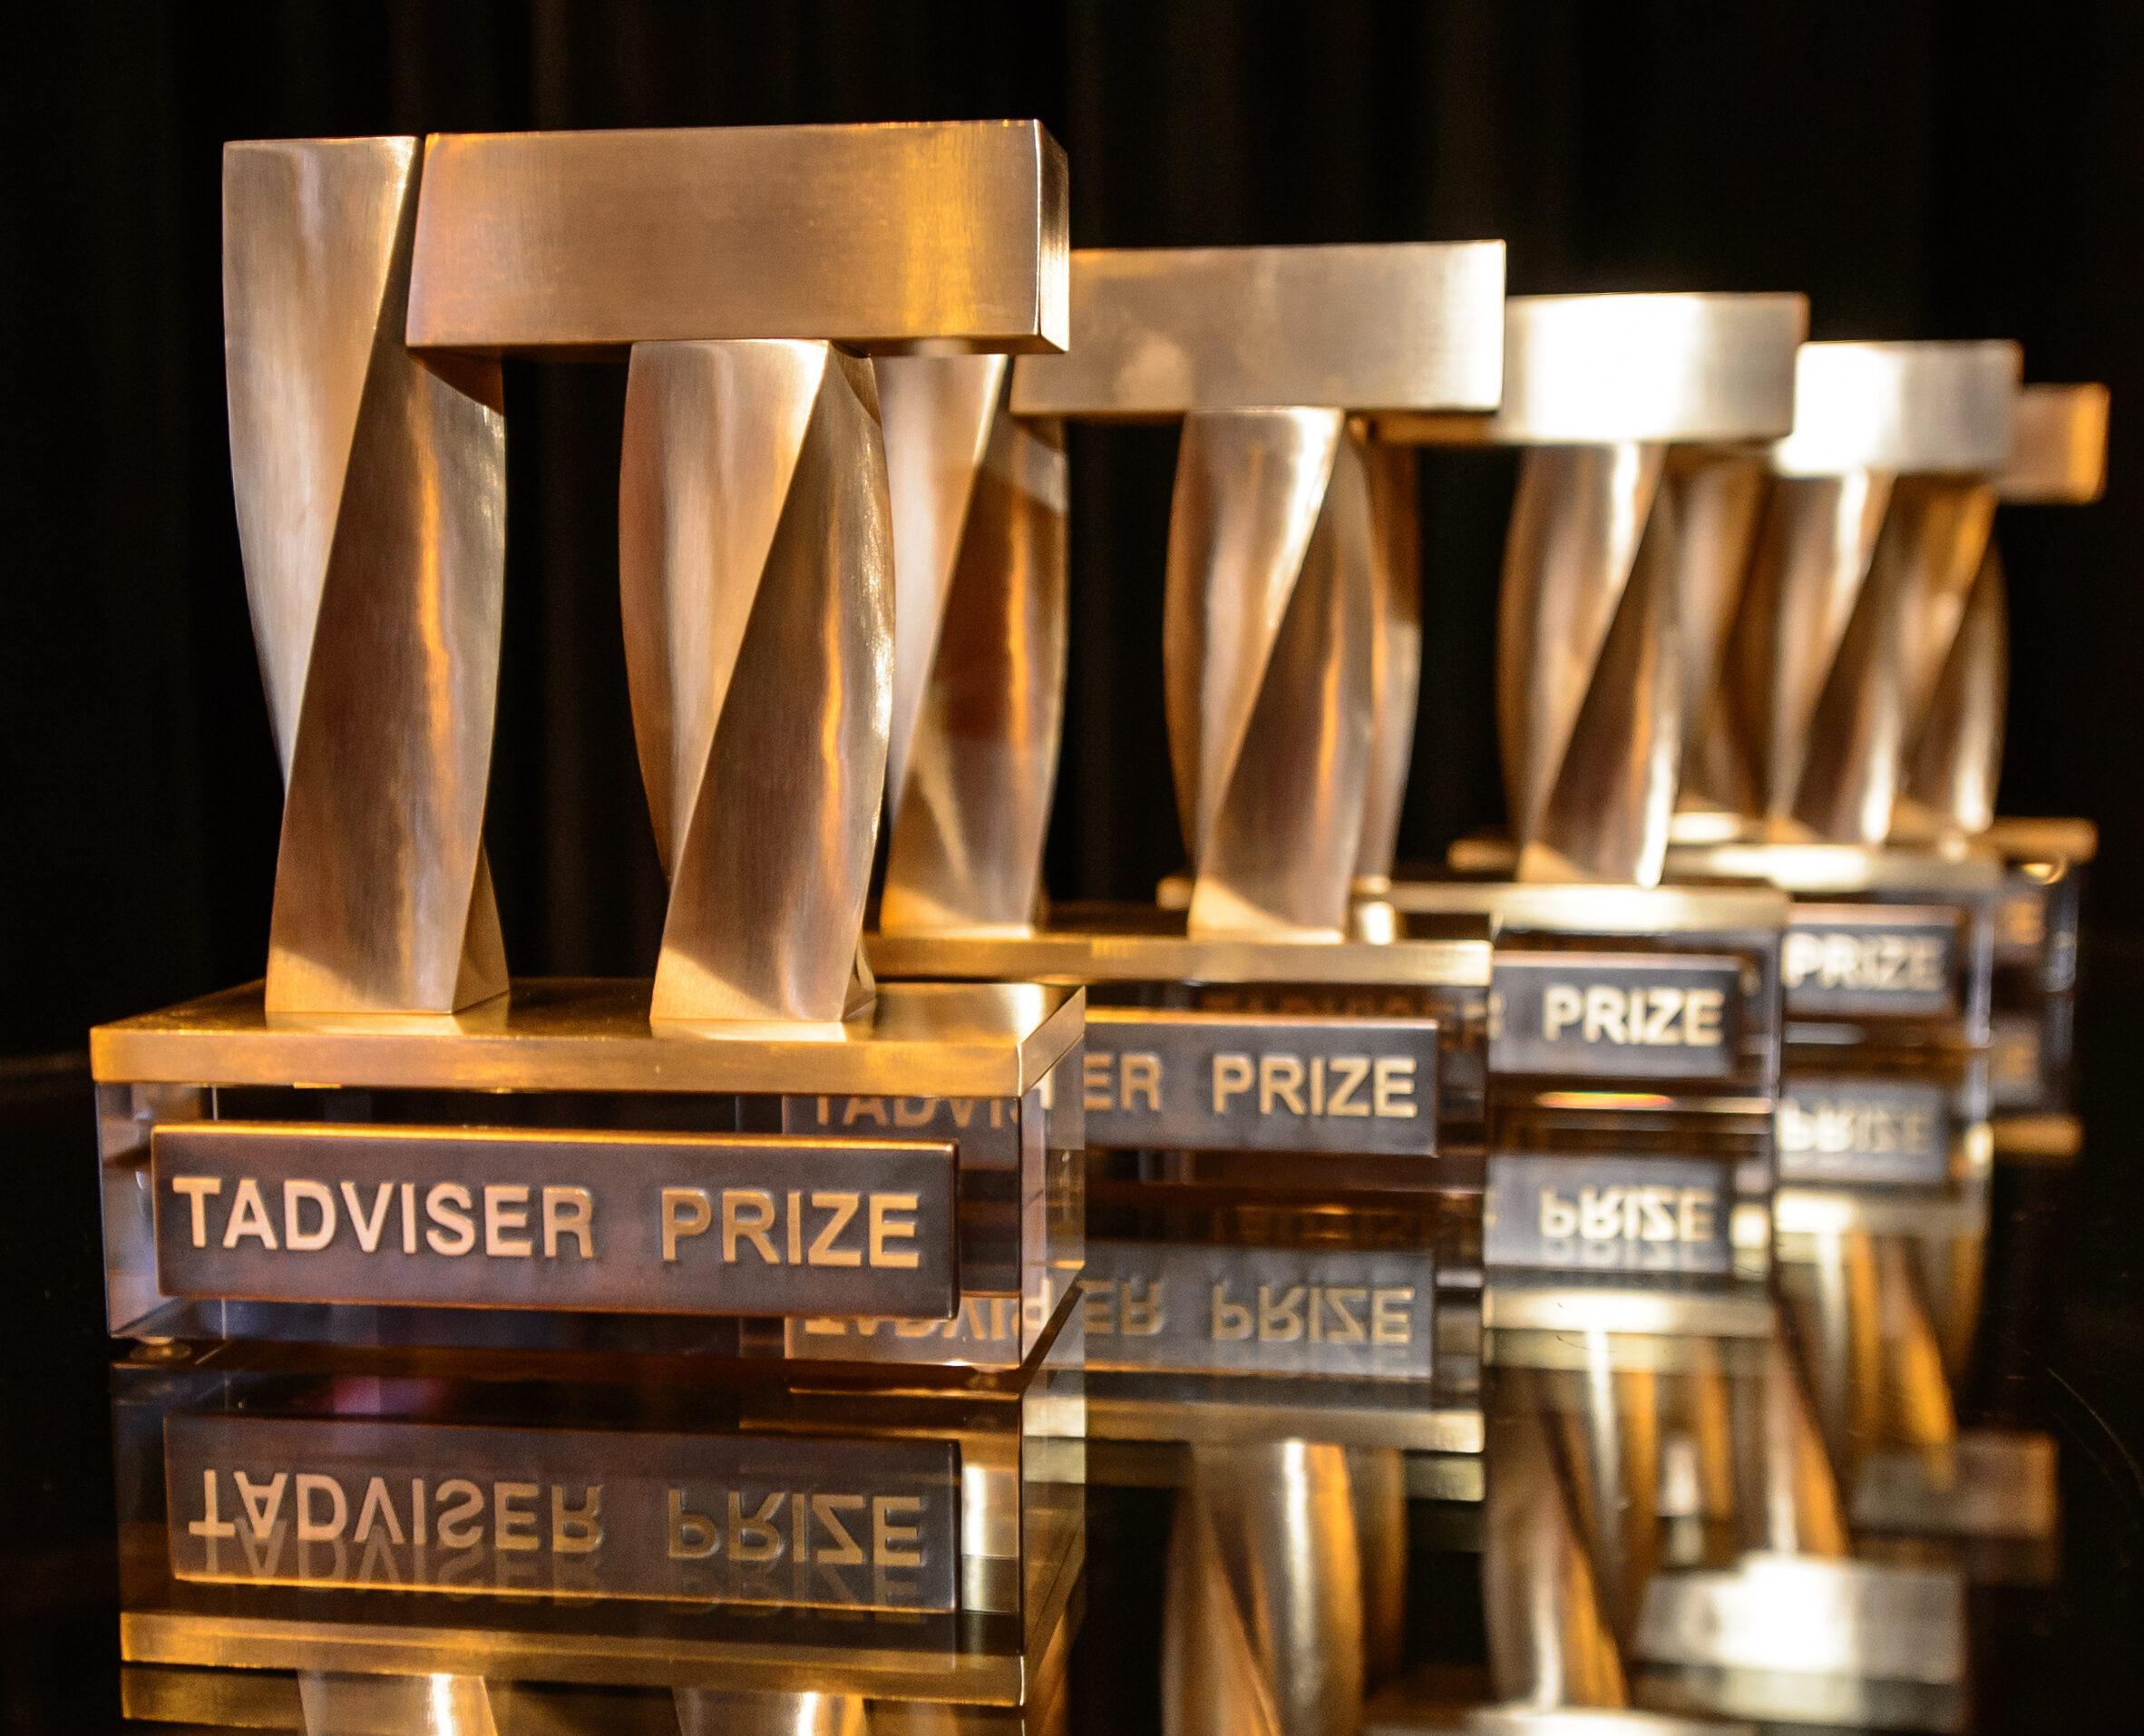 TAdviser_Prize